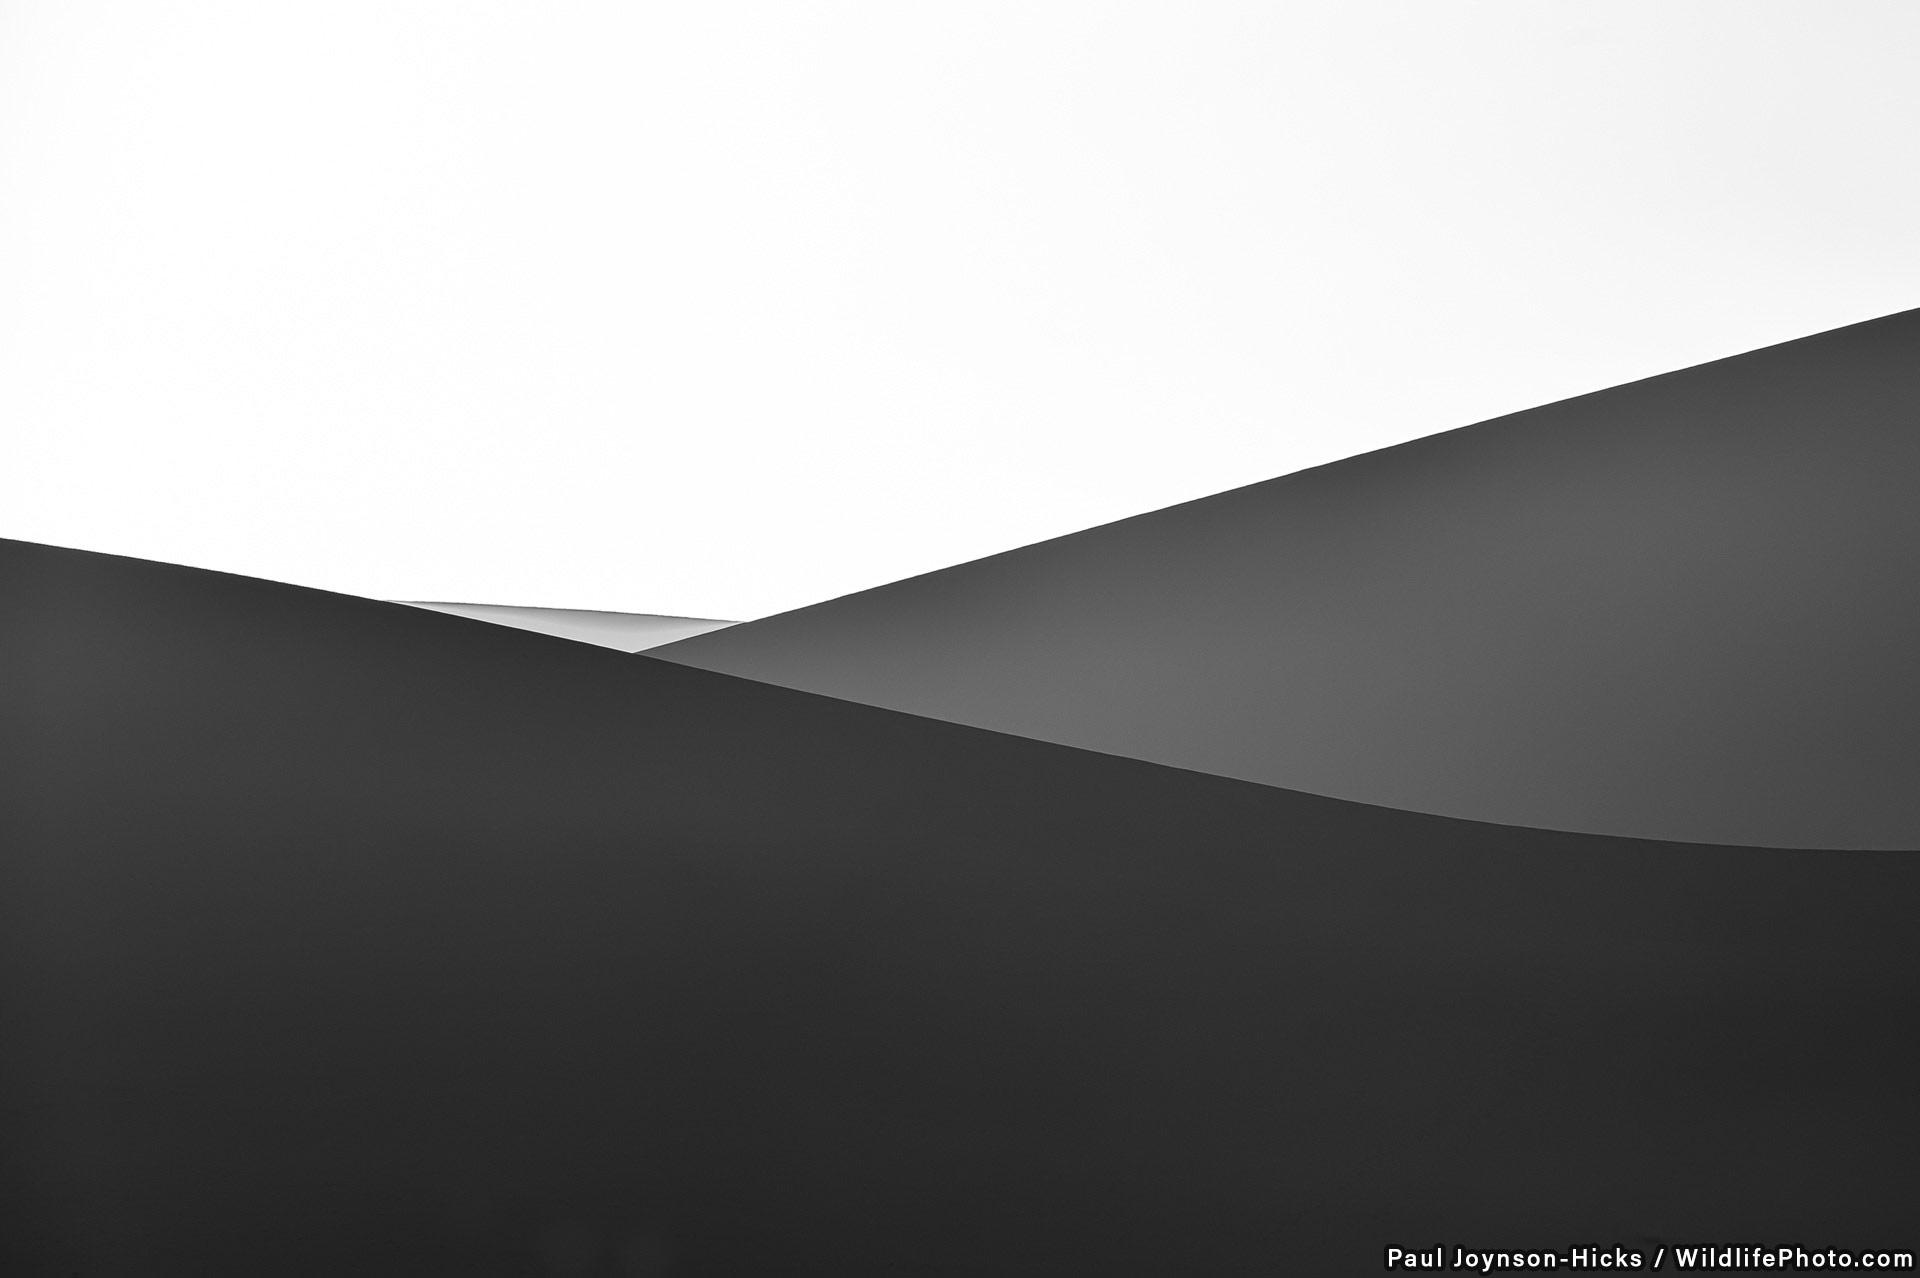 Dune Tones, © Paul Joynson-Hicks, Highly Commended, Habitats & Landscapes Photo Contest